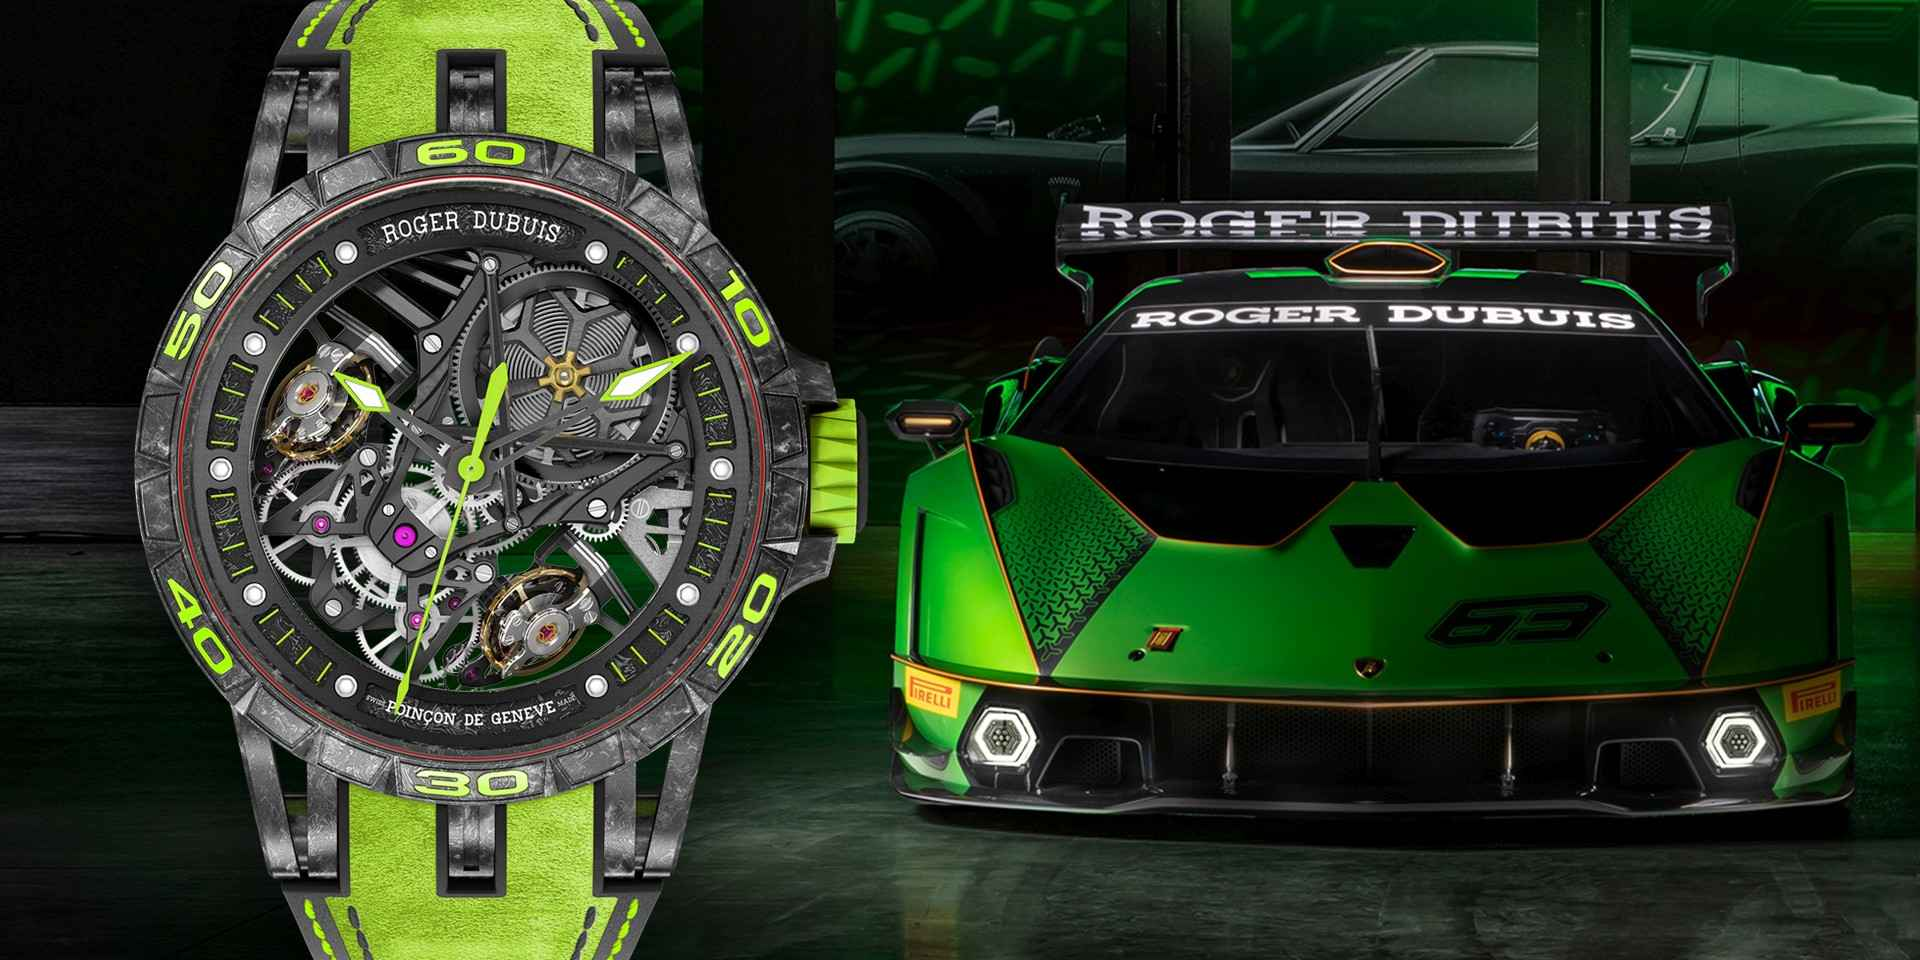 Roger Dubuis羅杰杜彼推出Excalibur Essenza SCV12超級訂製腕錶服務